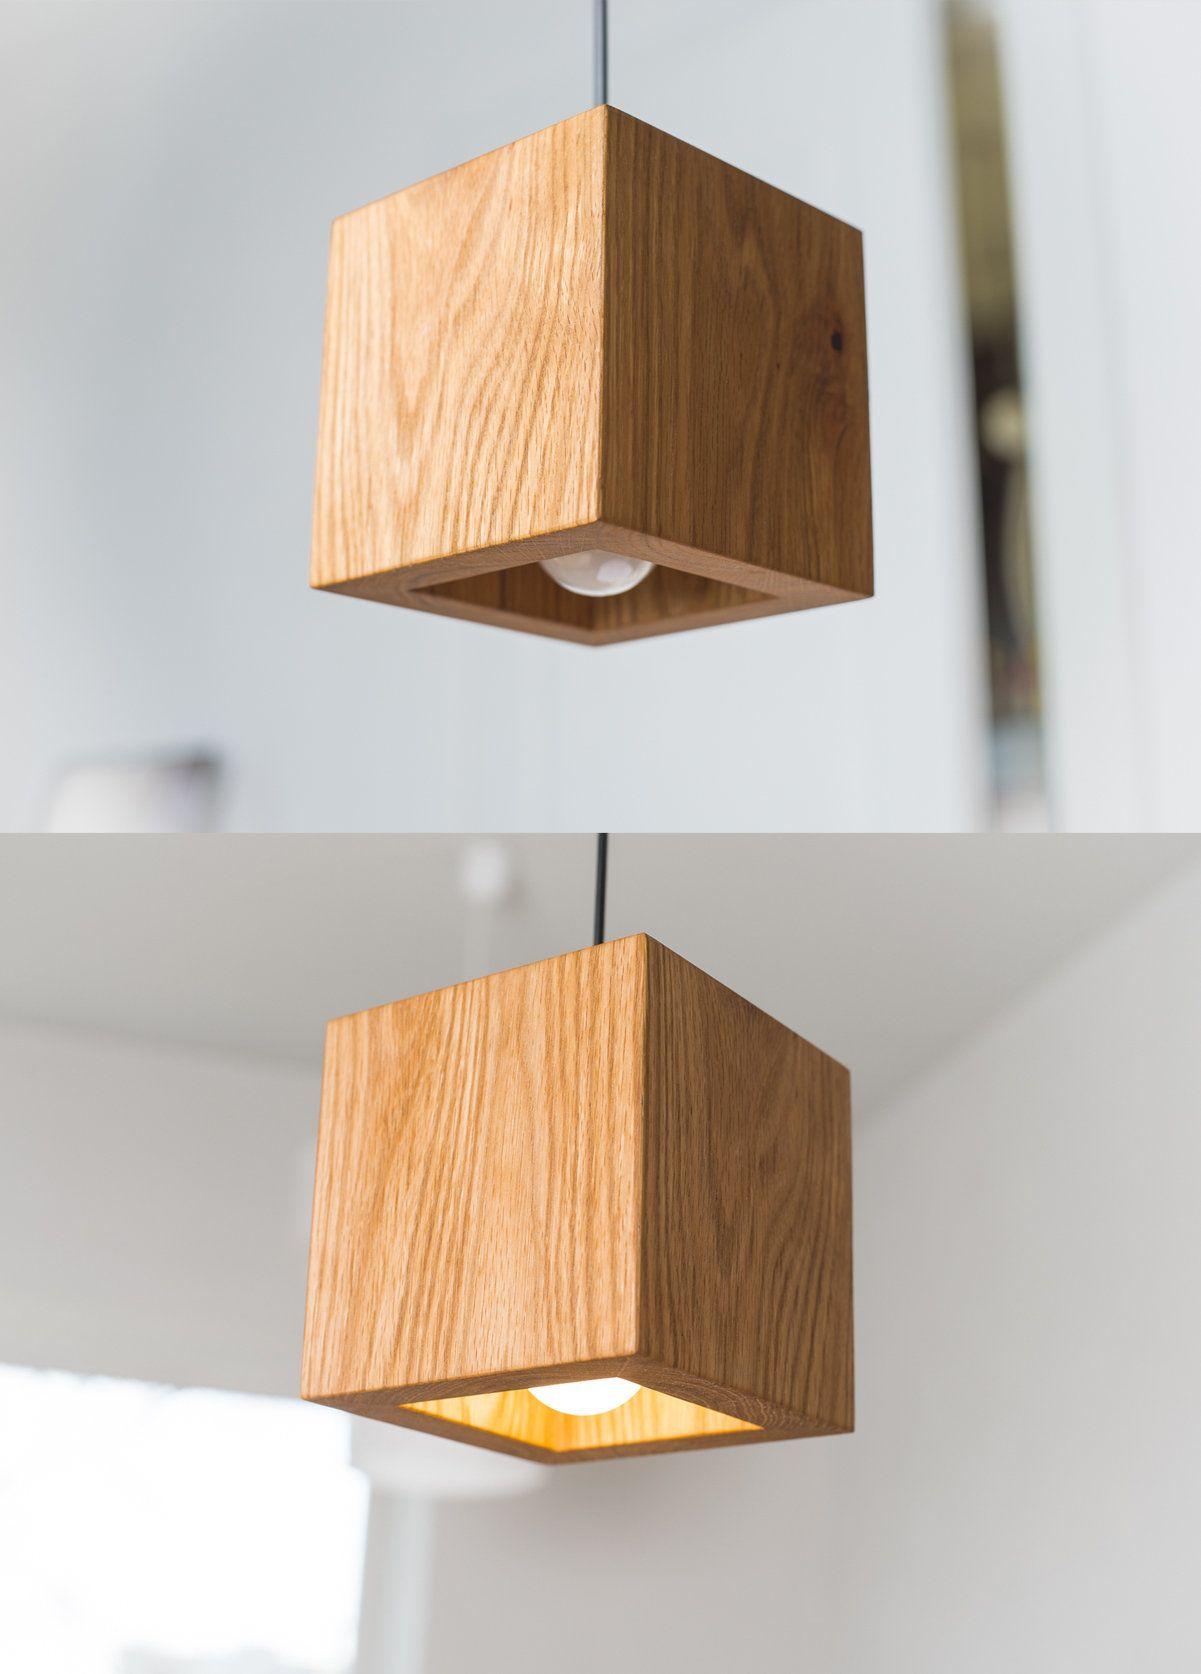 Pendant Light Shade Q424 Wooden Lamp Ceiling Light Cover Etsy Wooden Pendant Lighting Bedroom Lighting Diy Minimalist Wood Furniture